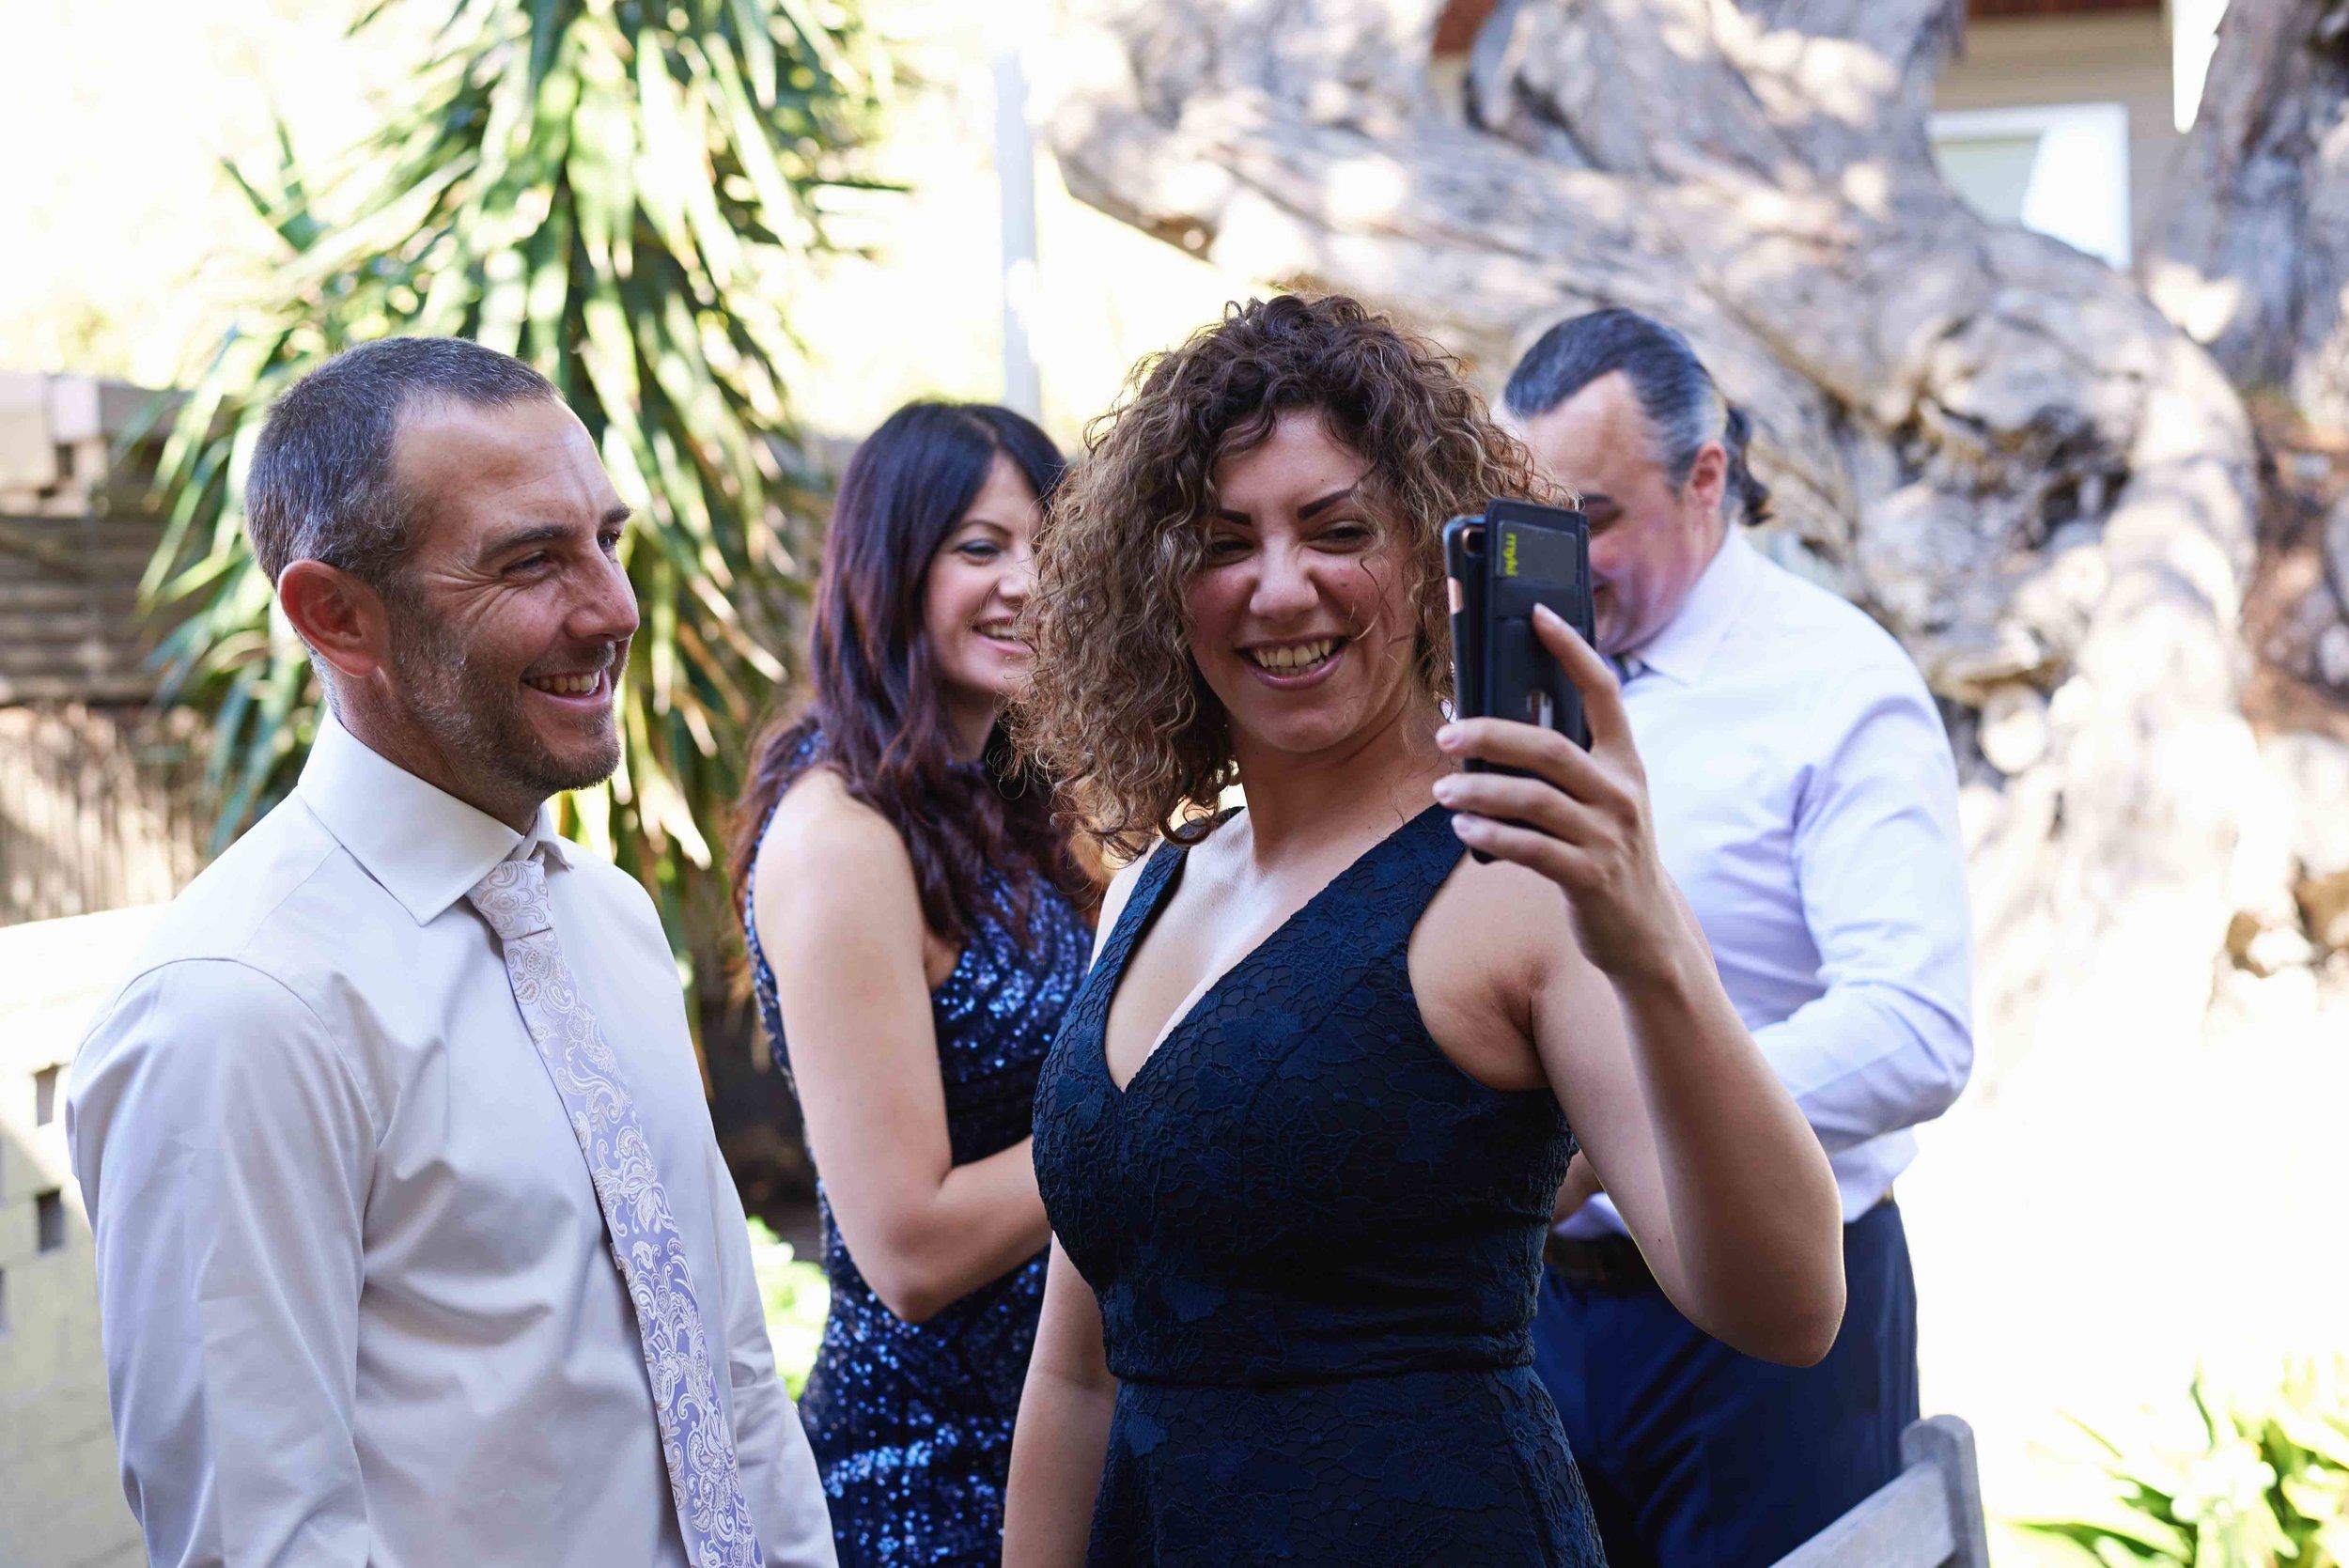 sorrento-wedding-photography-all-smiles-marissa-jade-photography-4.jpg